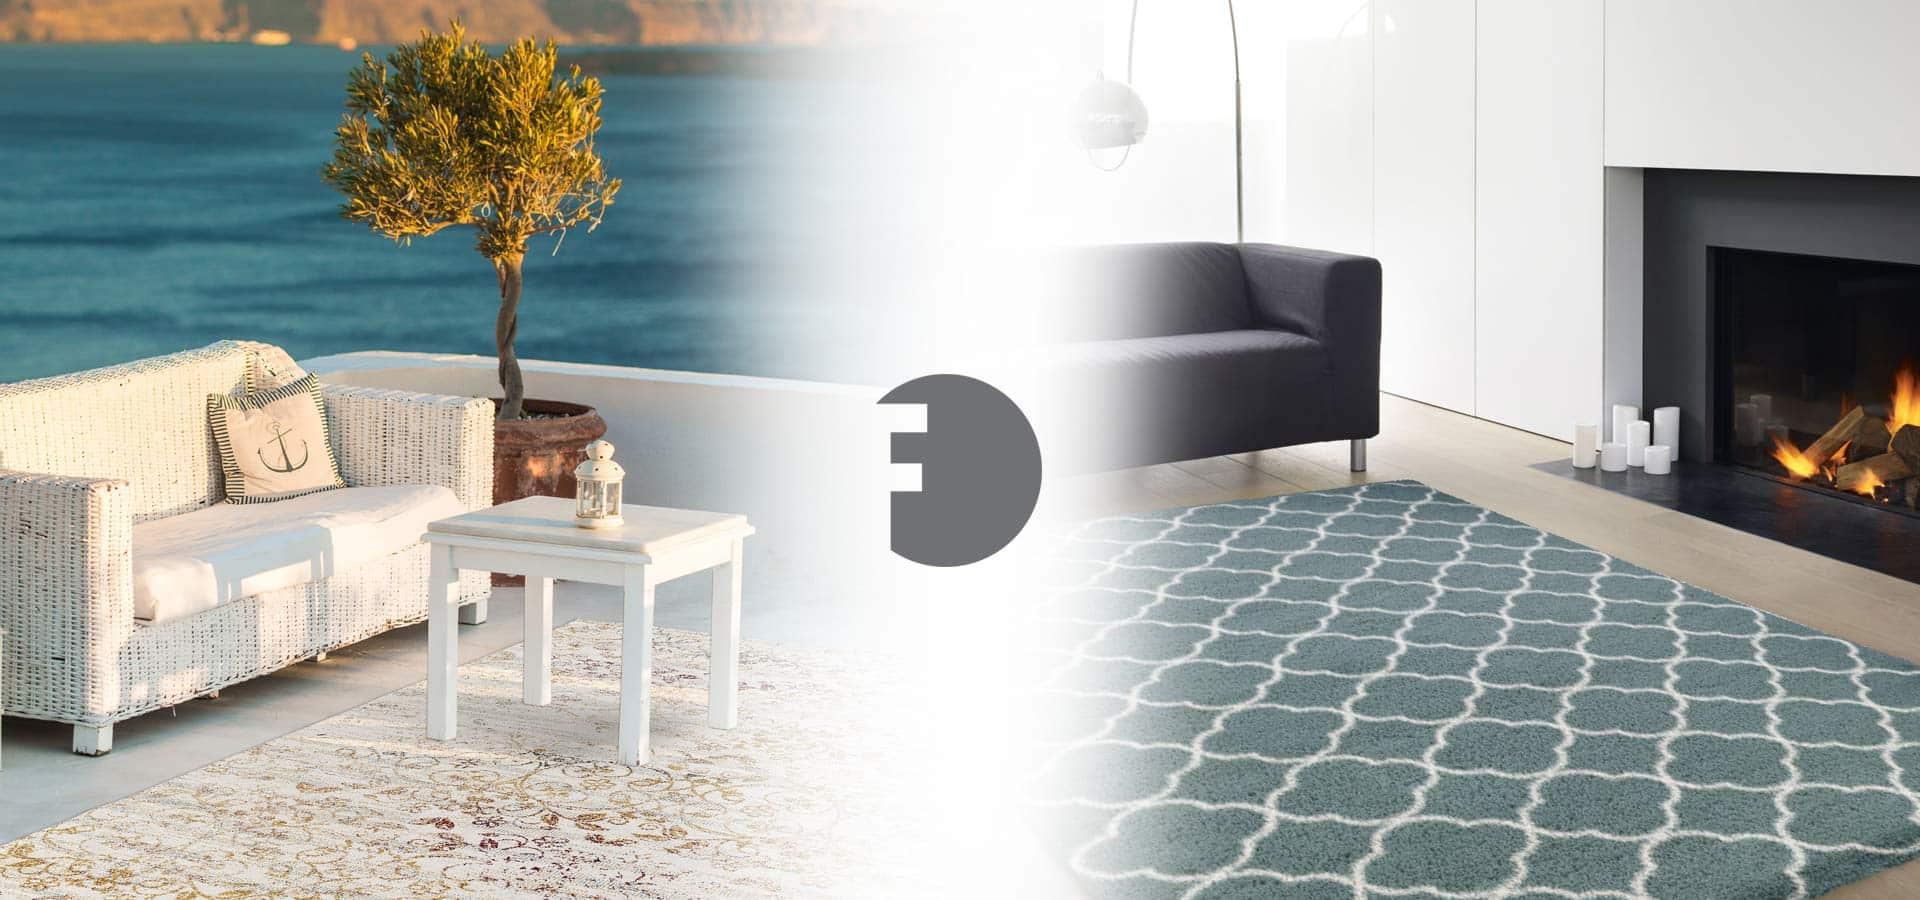 Fotakis Rugs & Floors - Indoor & Outdoor Rugs To Suit Your Style